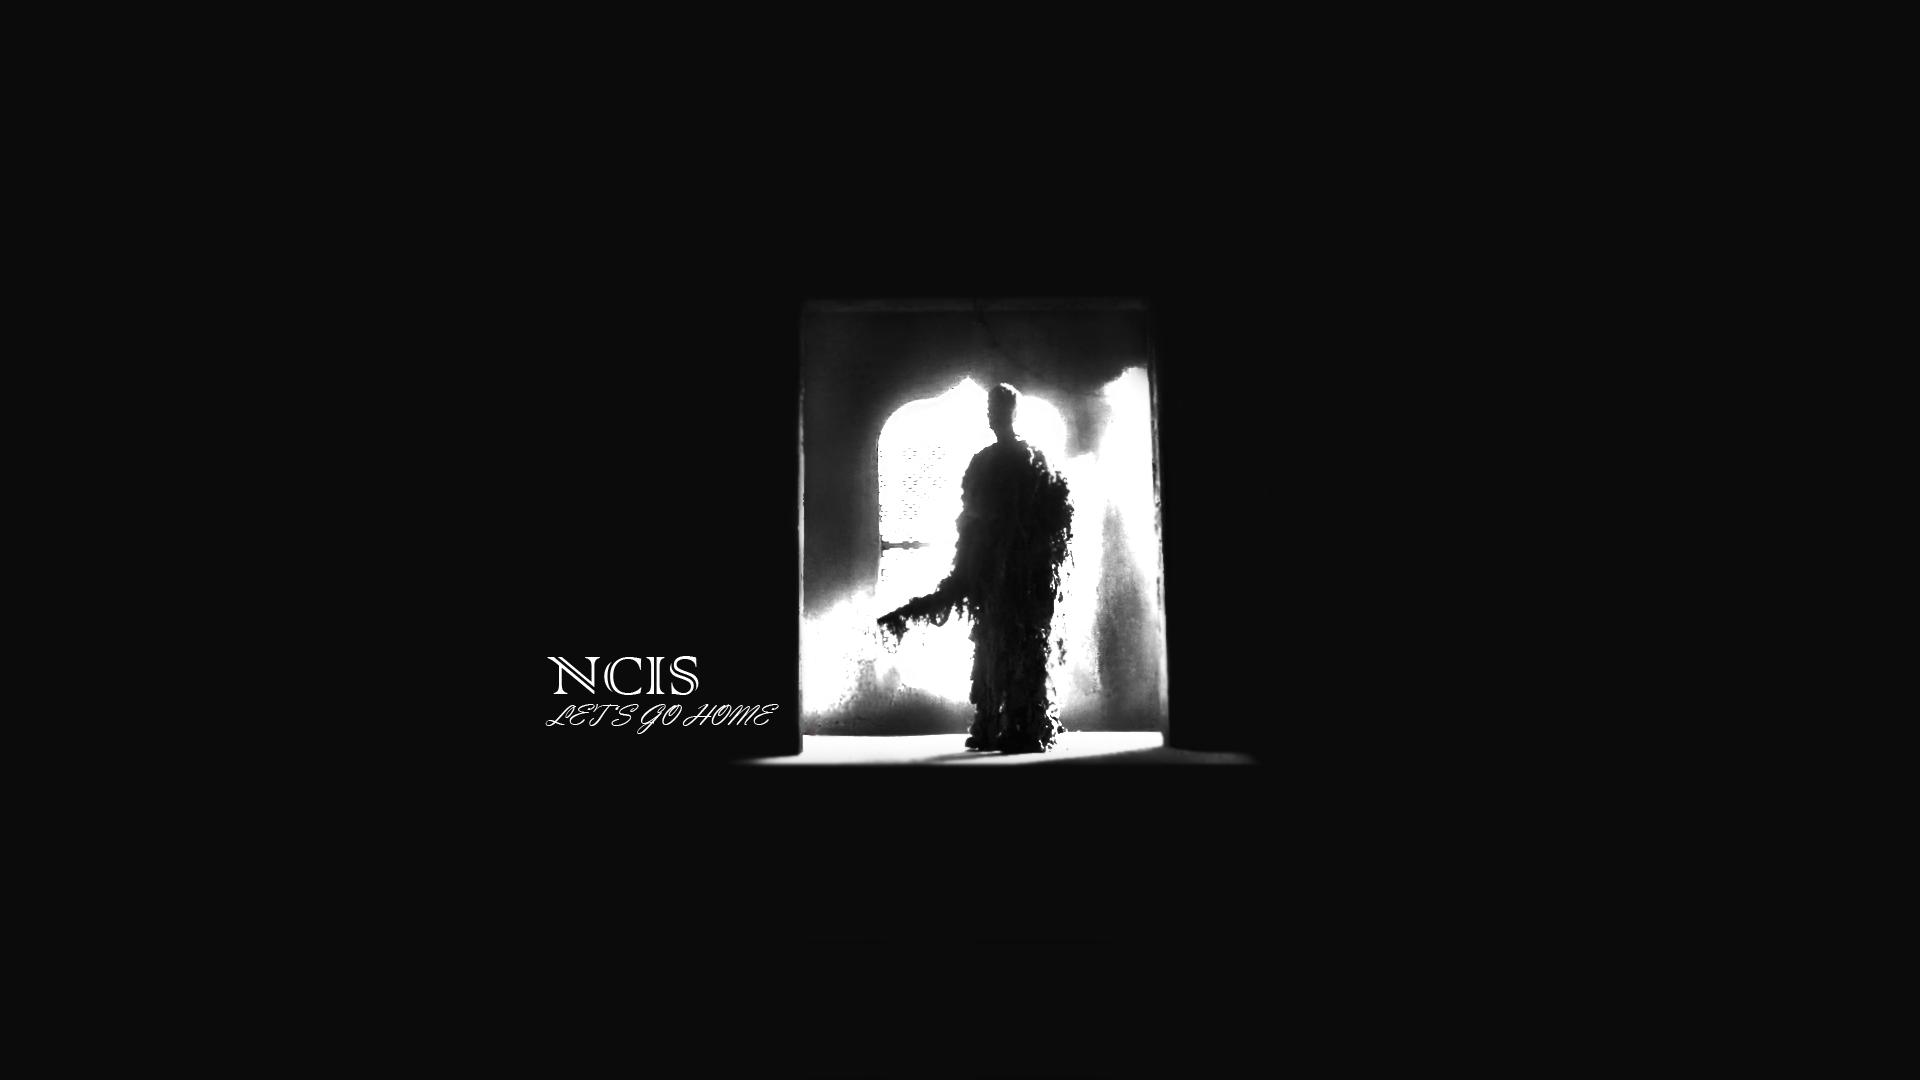 Ncis Logo Wallpaper Wallpaper letsgohome ncis 1920x1080